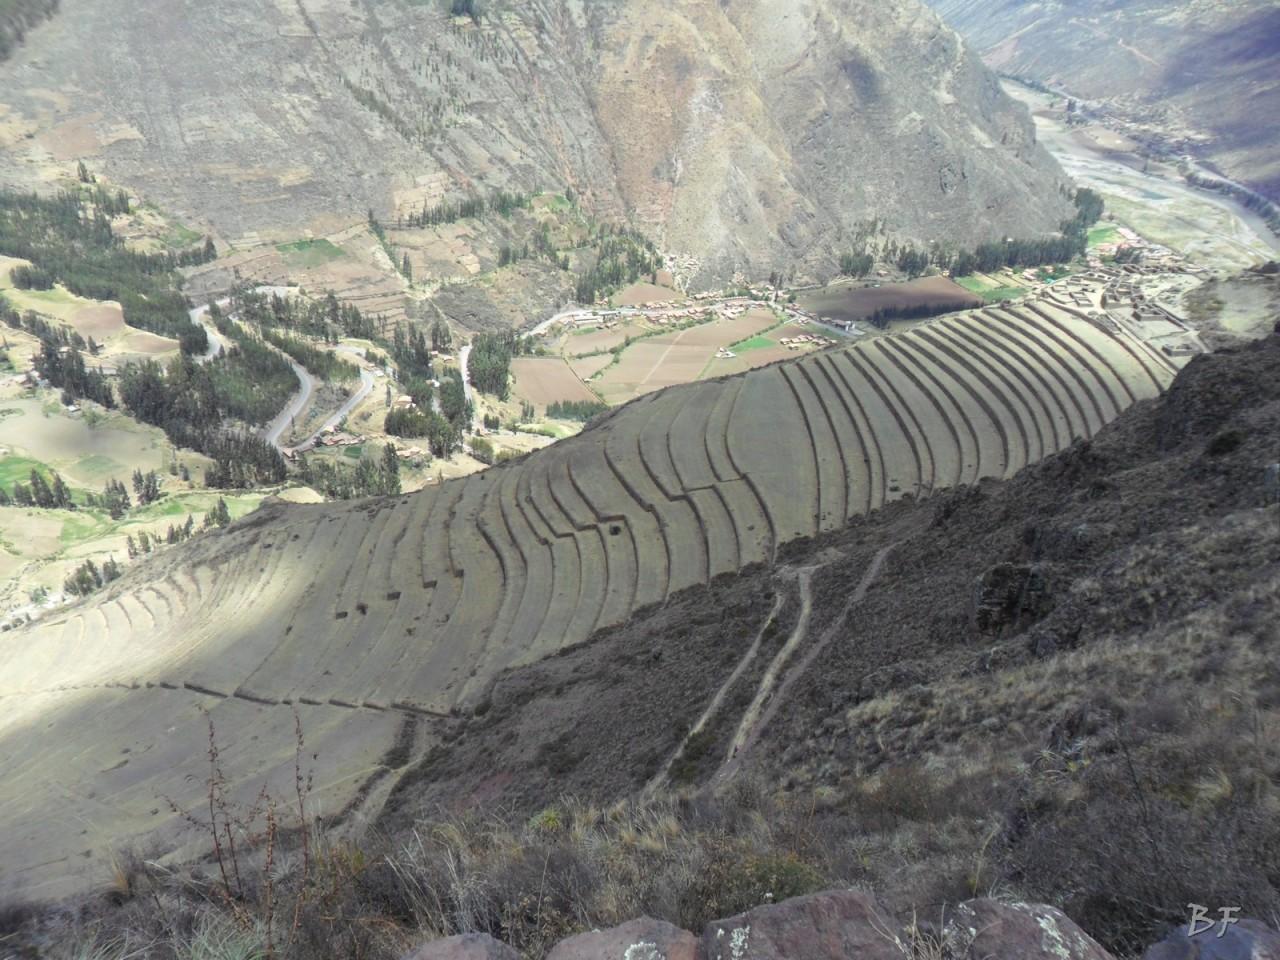 Mura-Poligonali-Megaliti-Altari-Rupestri-Pisac-Cusco-Perù-35